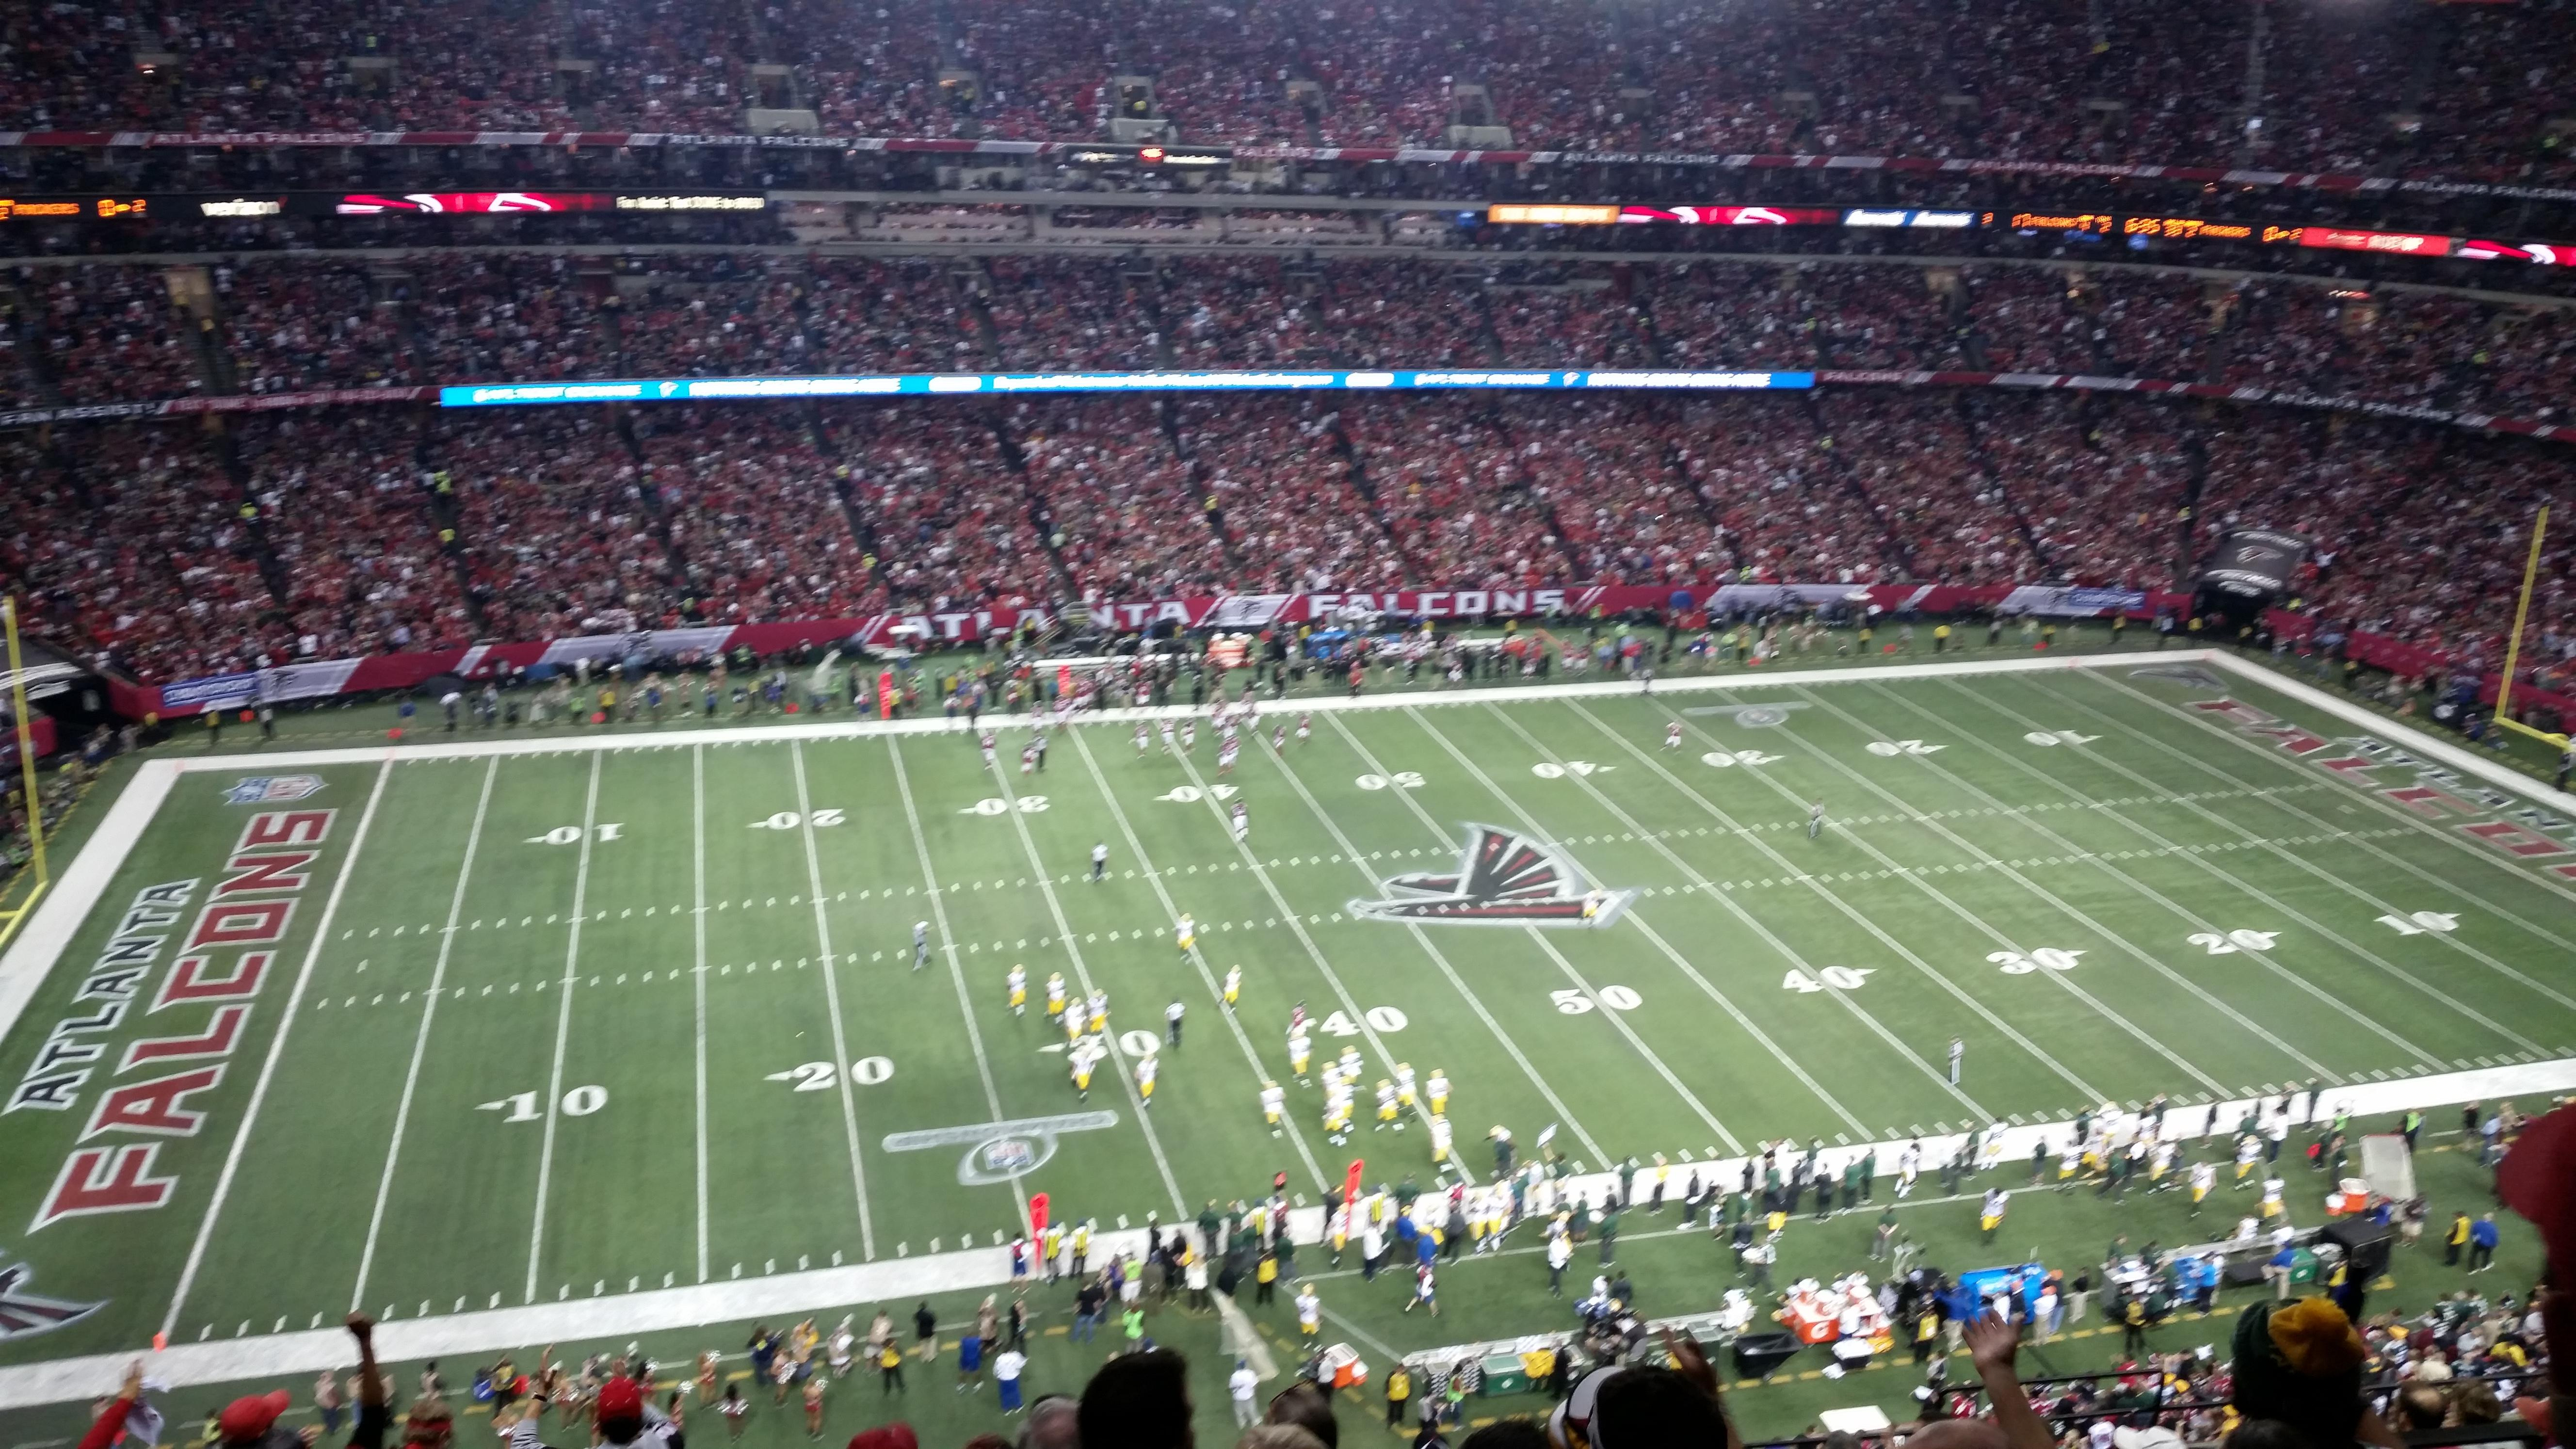 Georgia Dome Section 350 Row 11 Seat 14